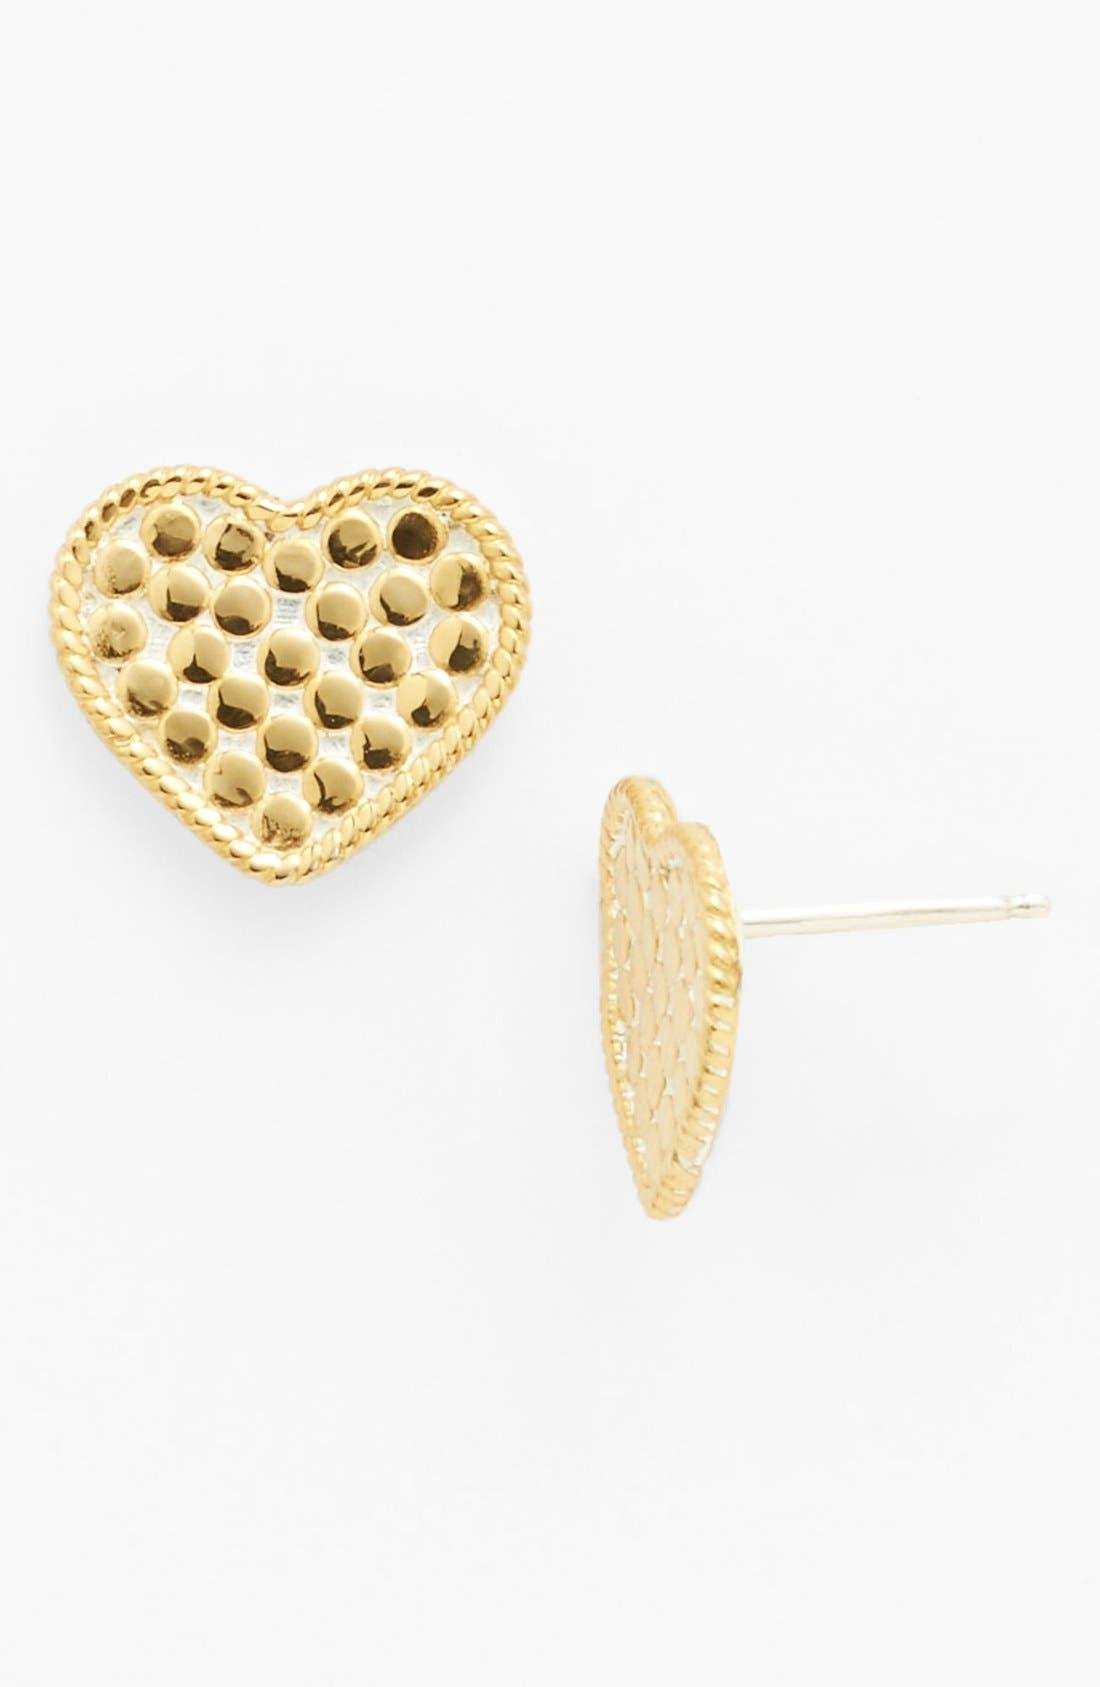 Main Image - Anna Beck 'Gili' Heart Stud Earrings